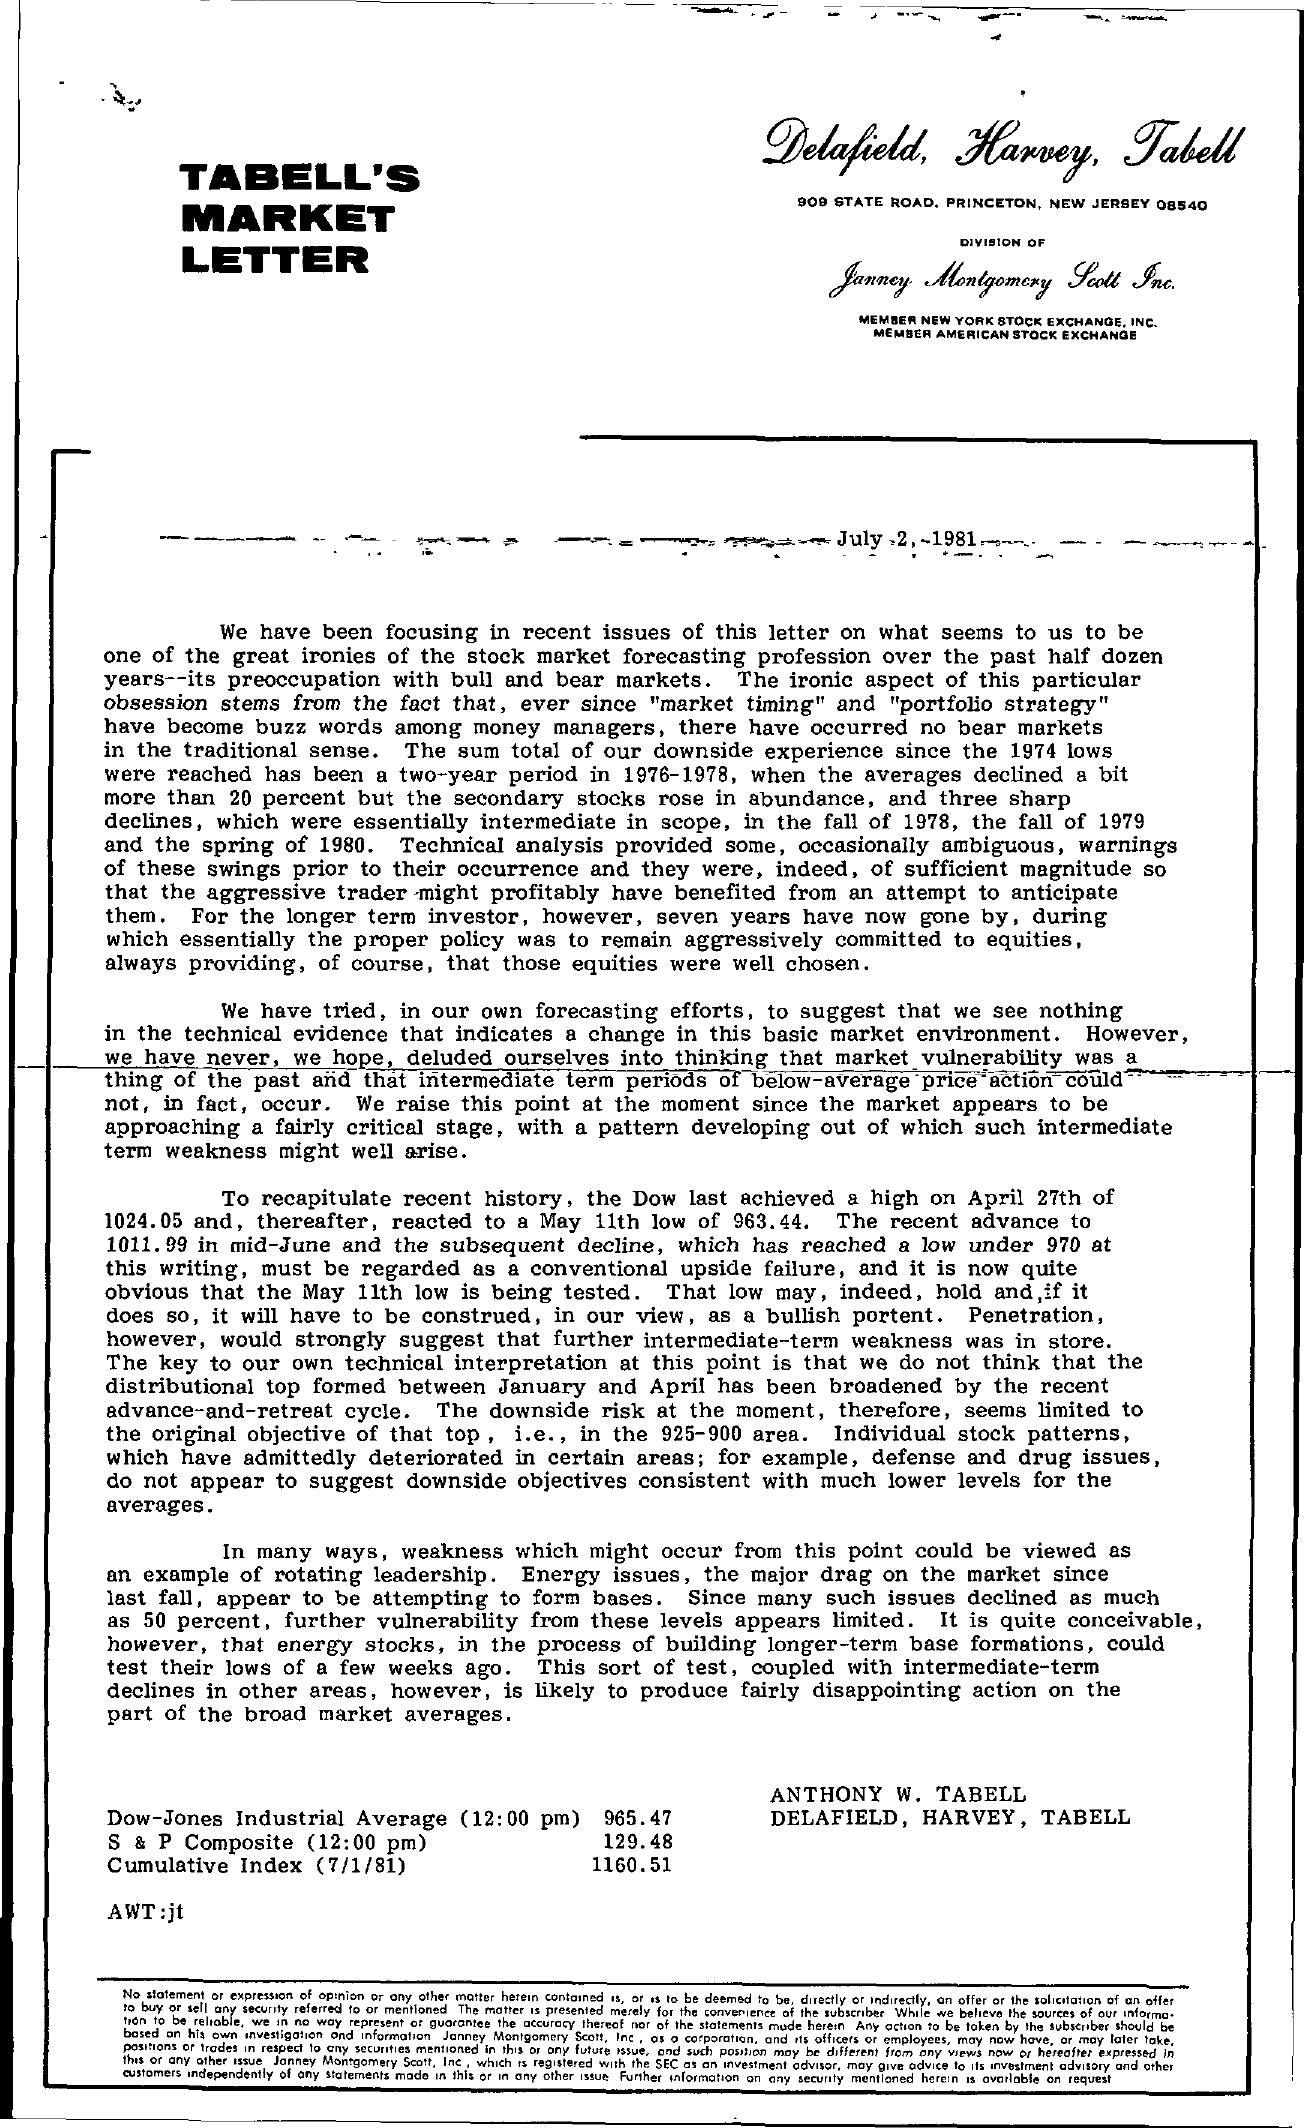 Tabell's Market Letter - July 02, 1981